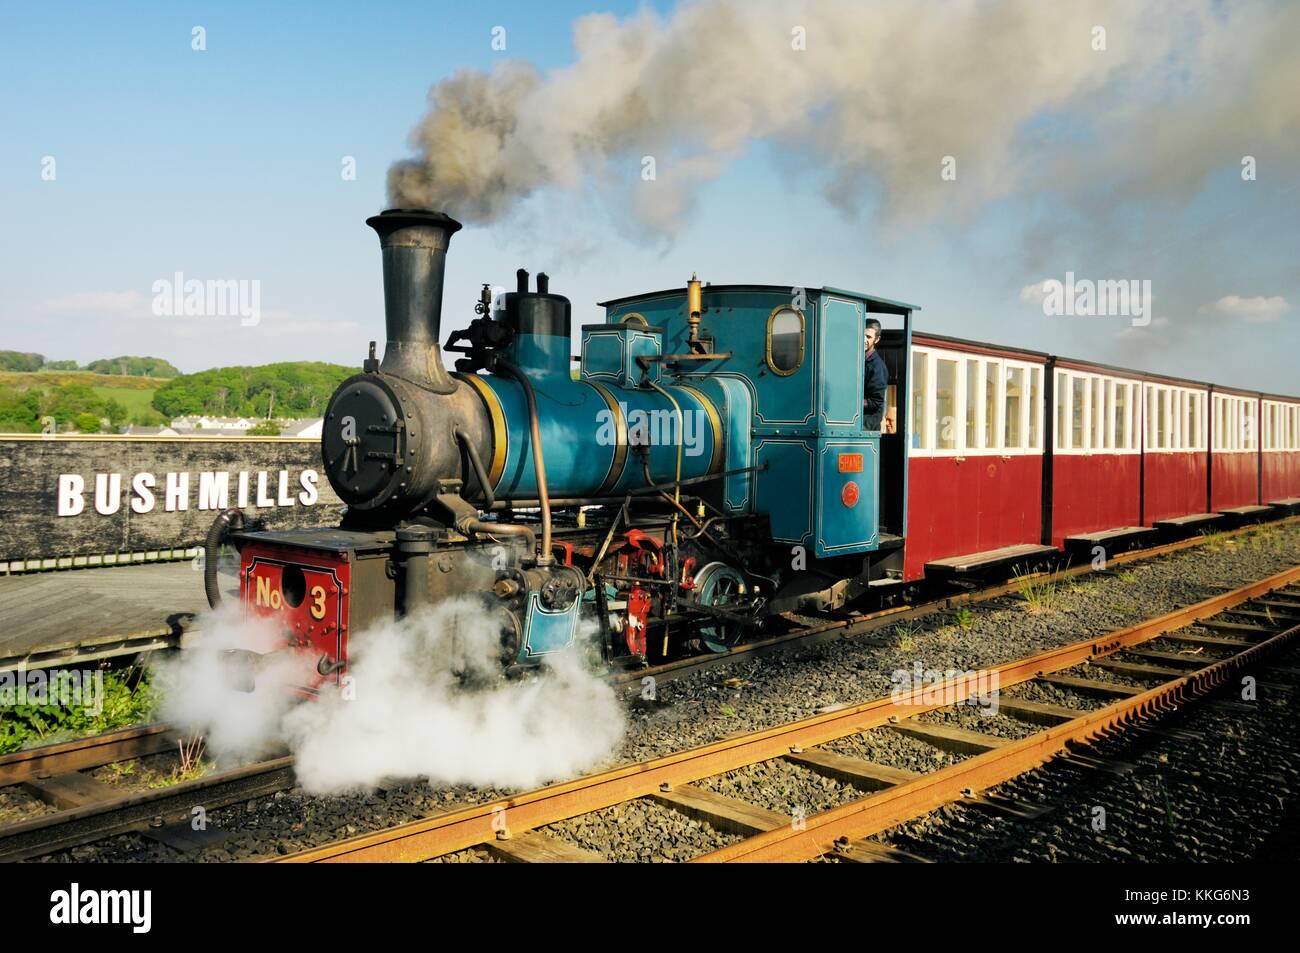 Giants Causeway and Bushmills Railway narrow gauge steam train engine at the Bushmills platform, County Antrim, - Stock Image